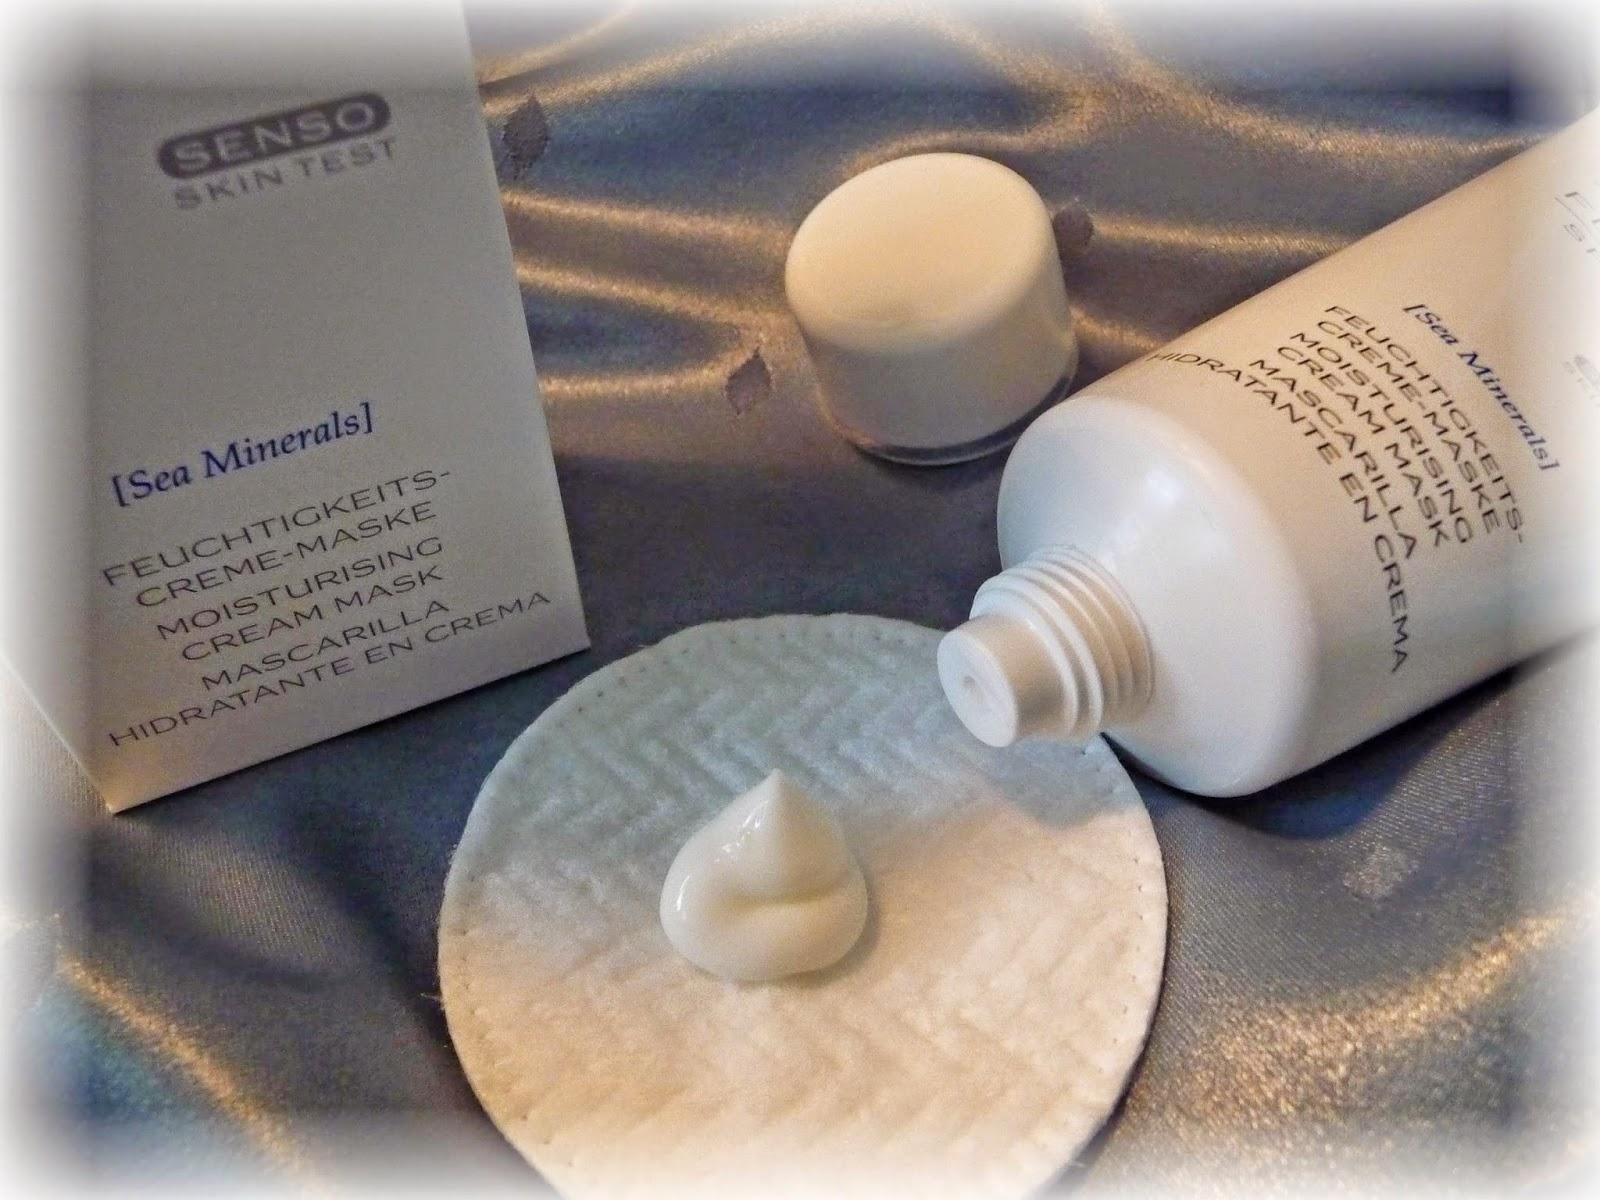 La mer Cosmetics Cuxhaven Feuchtigkeits-Creme-Maske